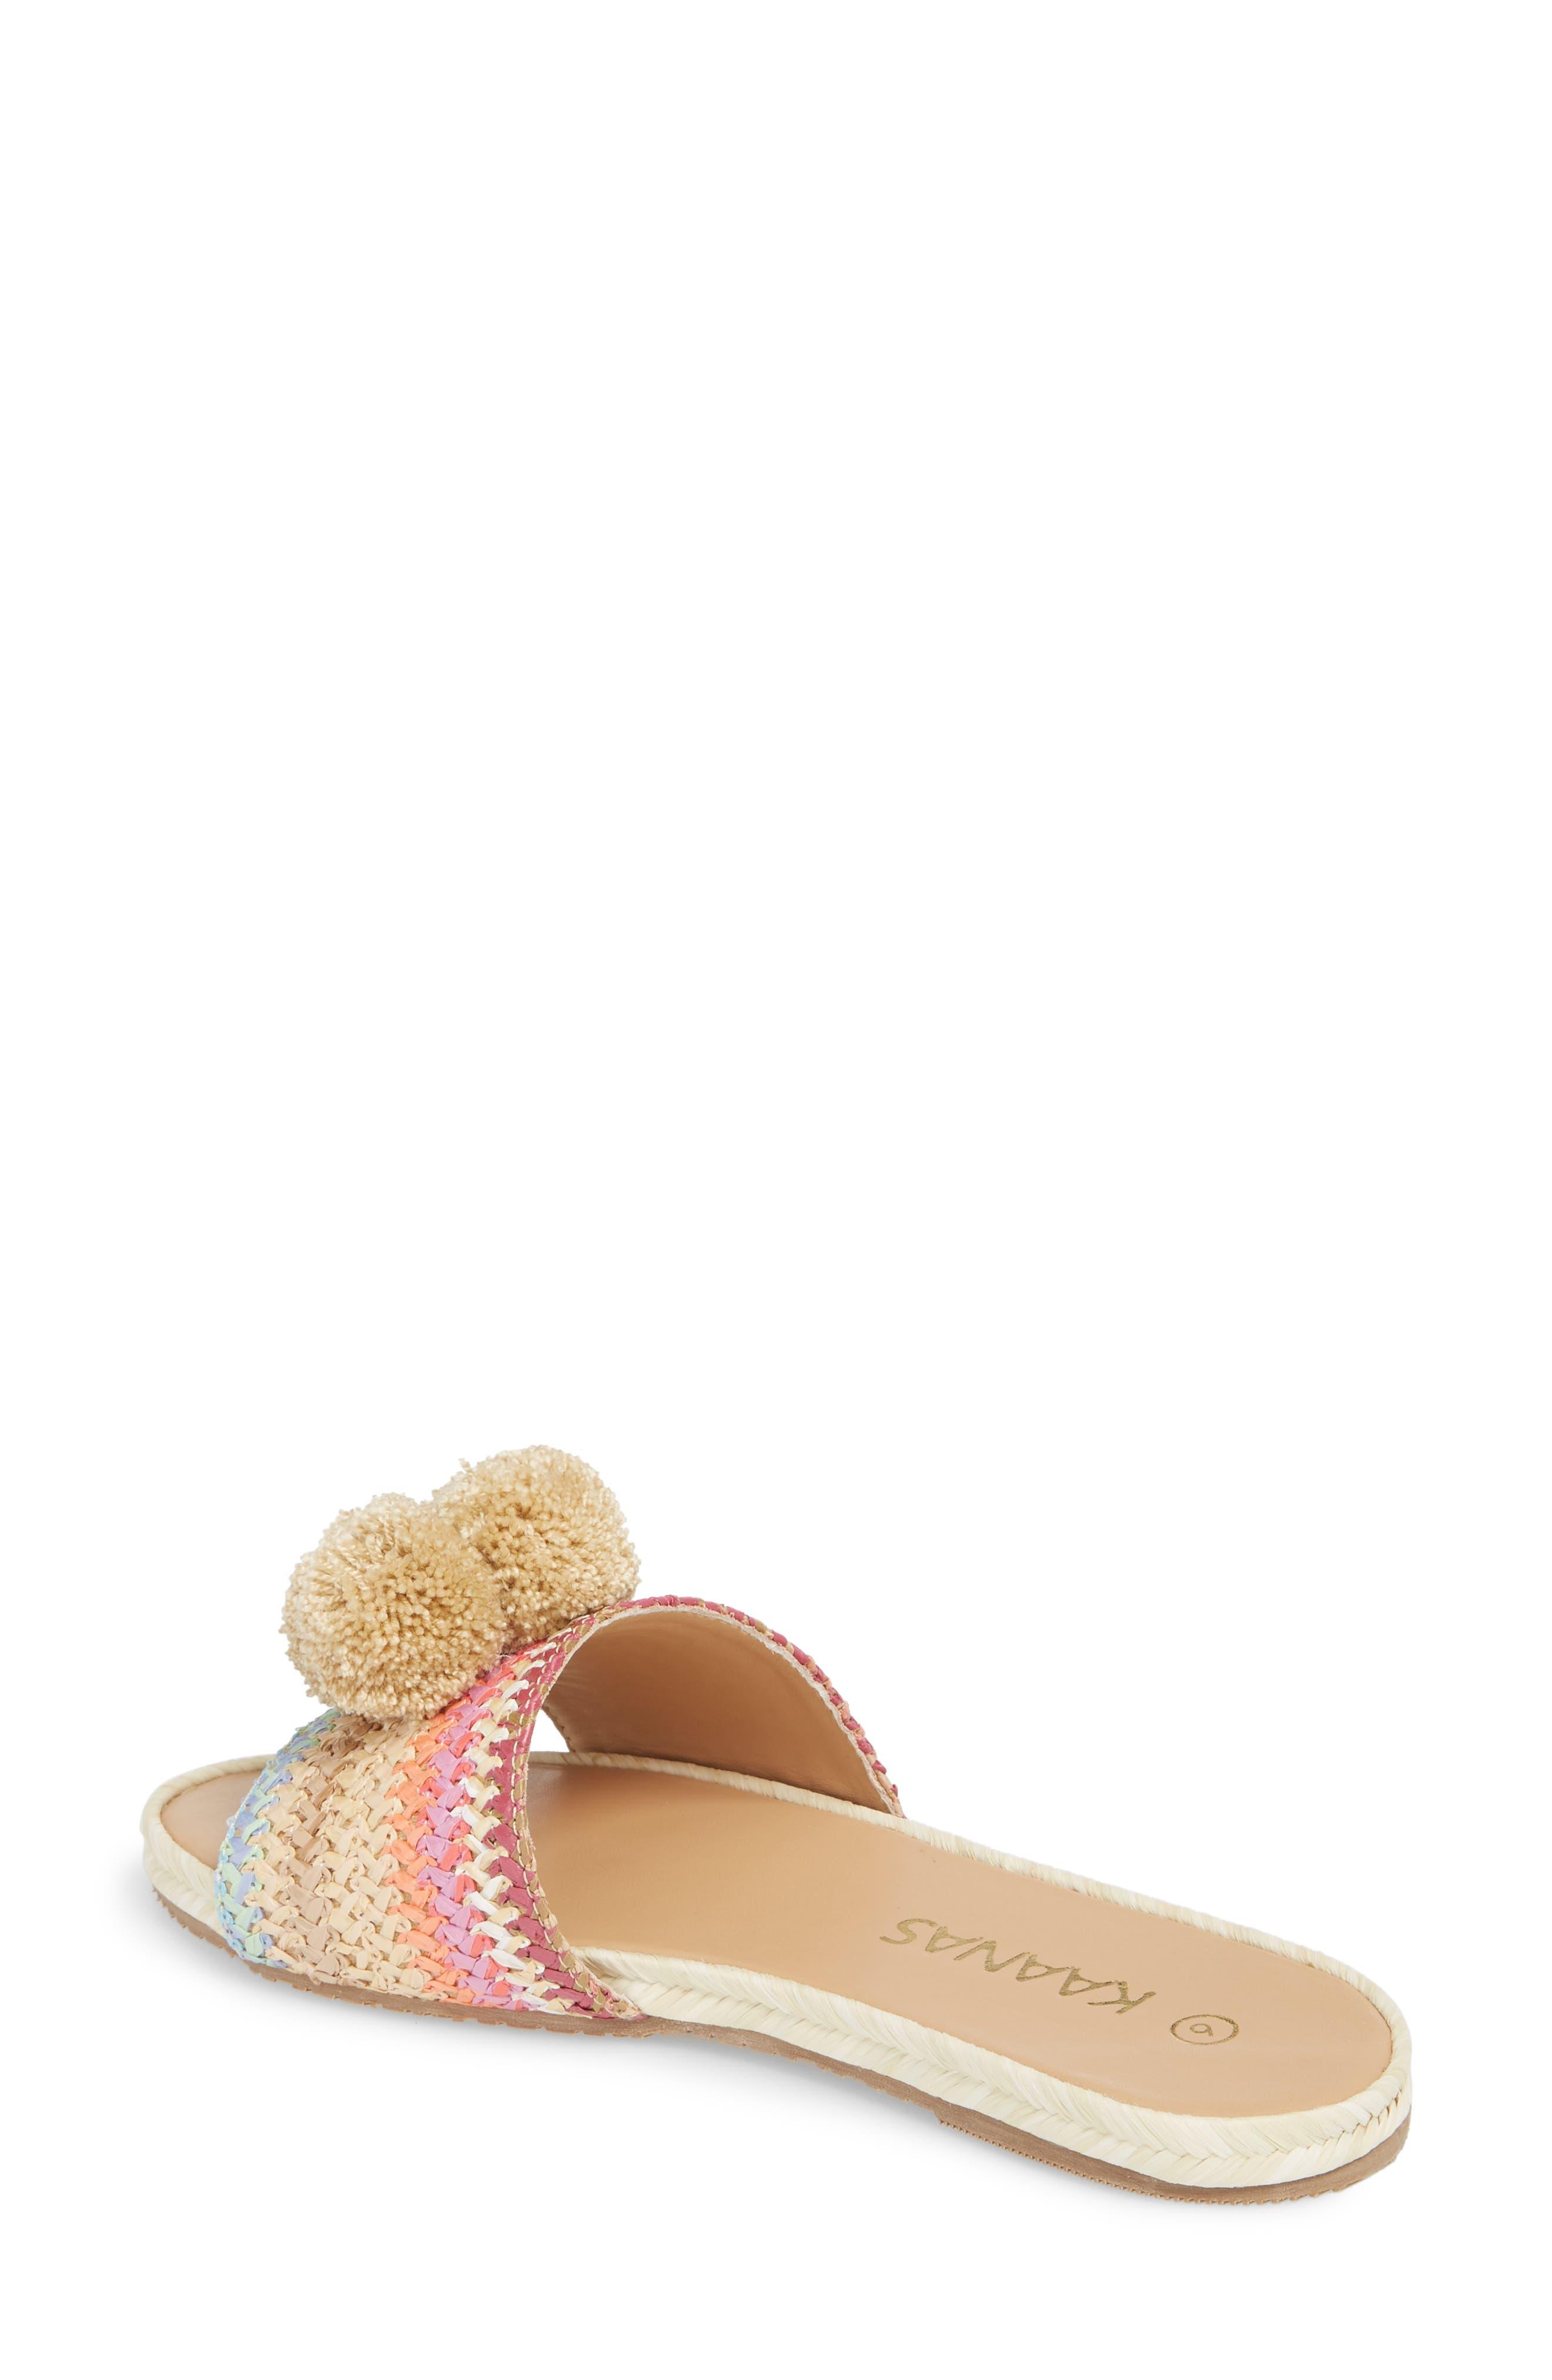 Santa Helena Pom Slide Sandal,                             Alternate thumbnail 2, color,                             Bright Multi